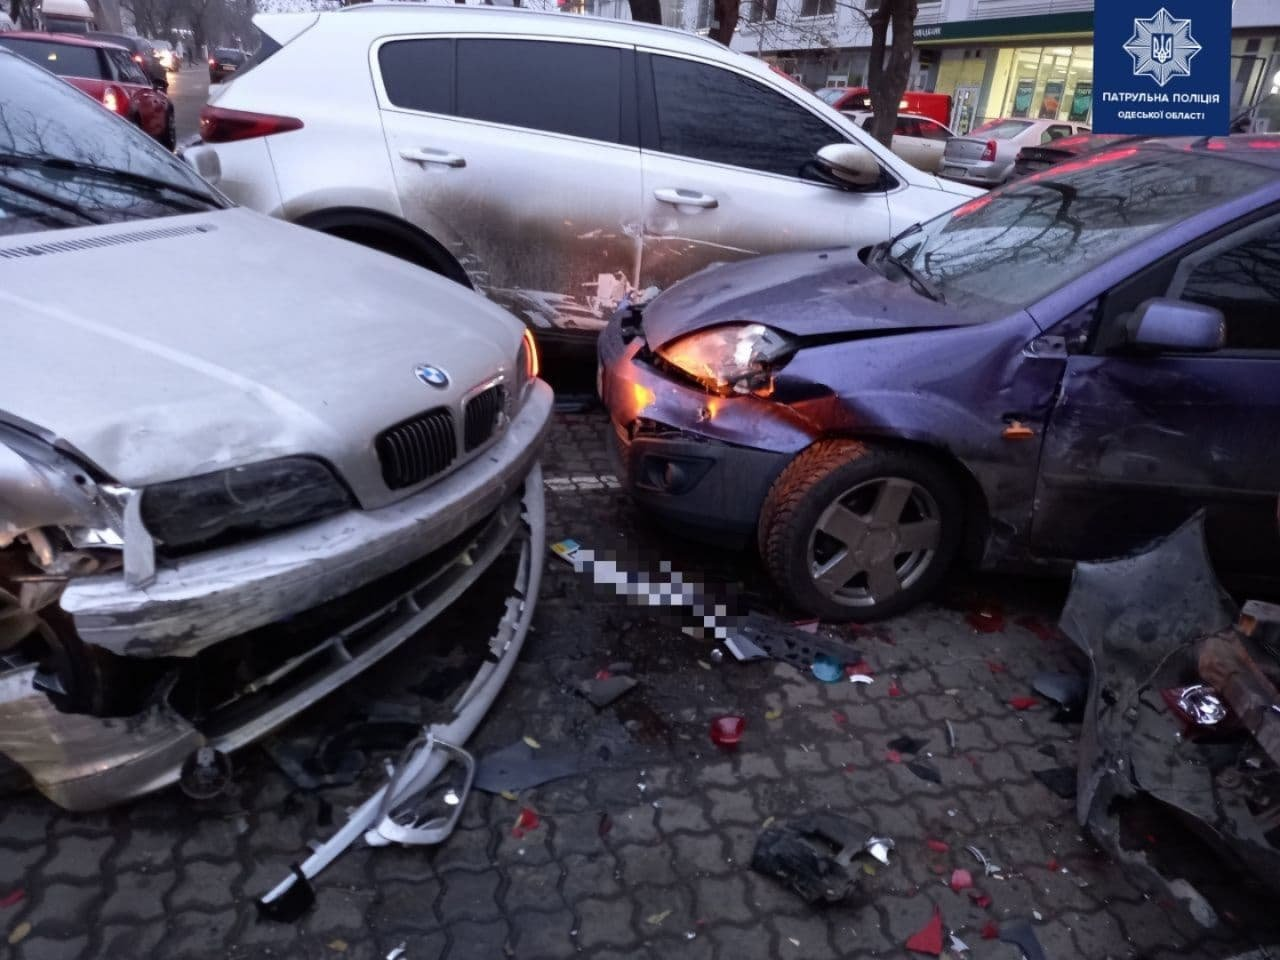 В Одессе автоледи на BMW разбила четыре машины, - ФОТО, ВИДЕО , фото-1